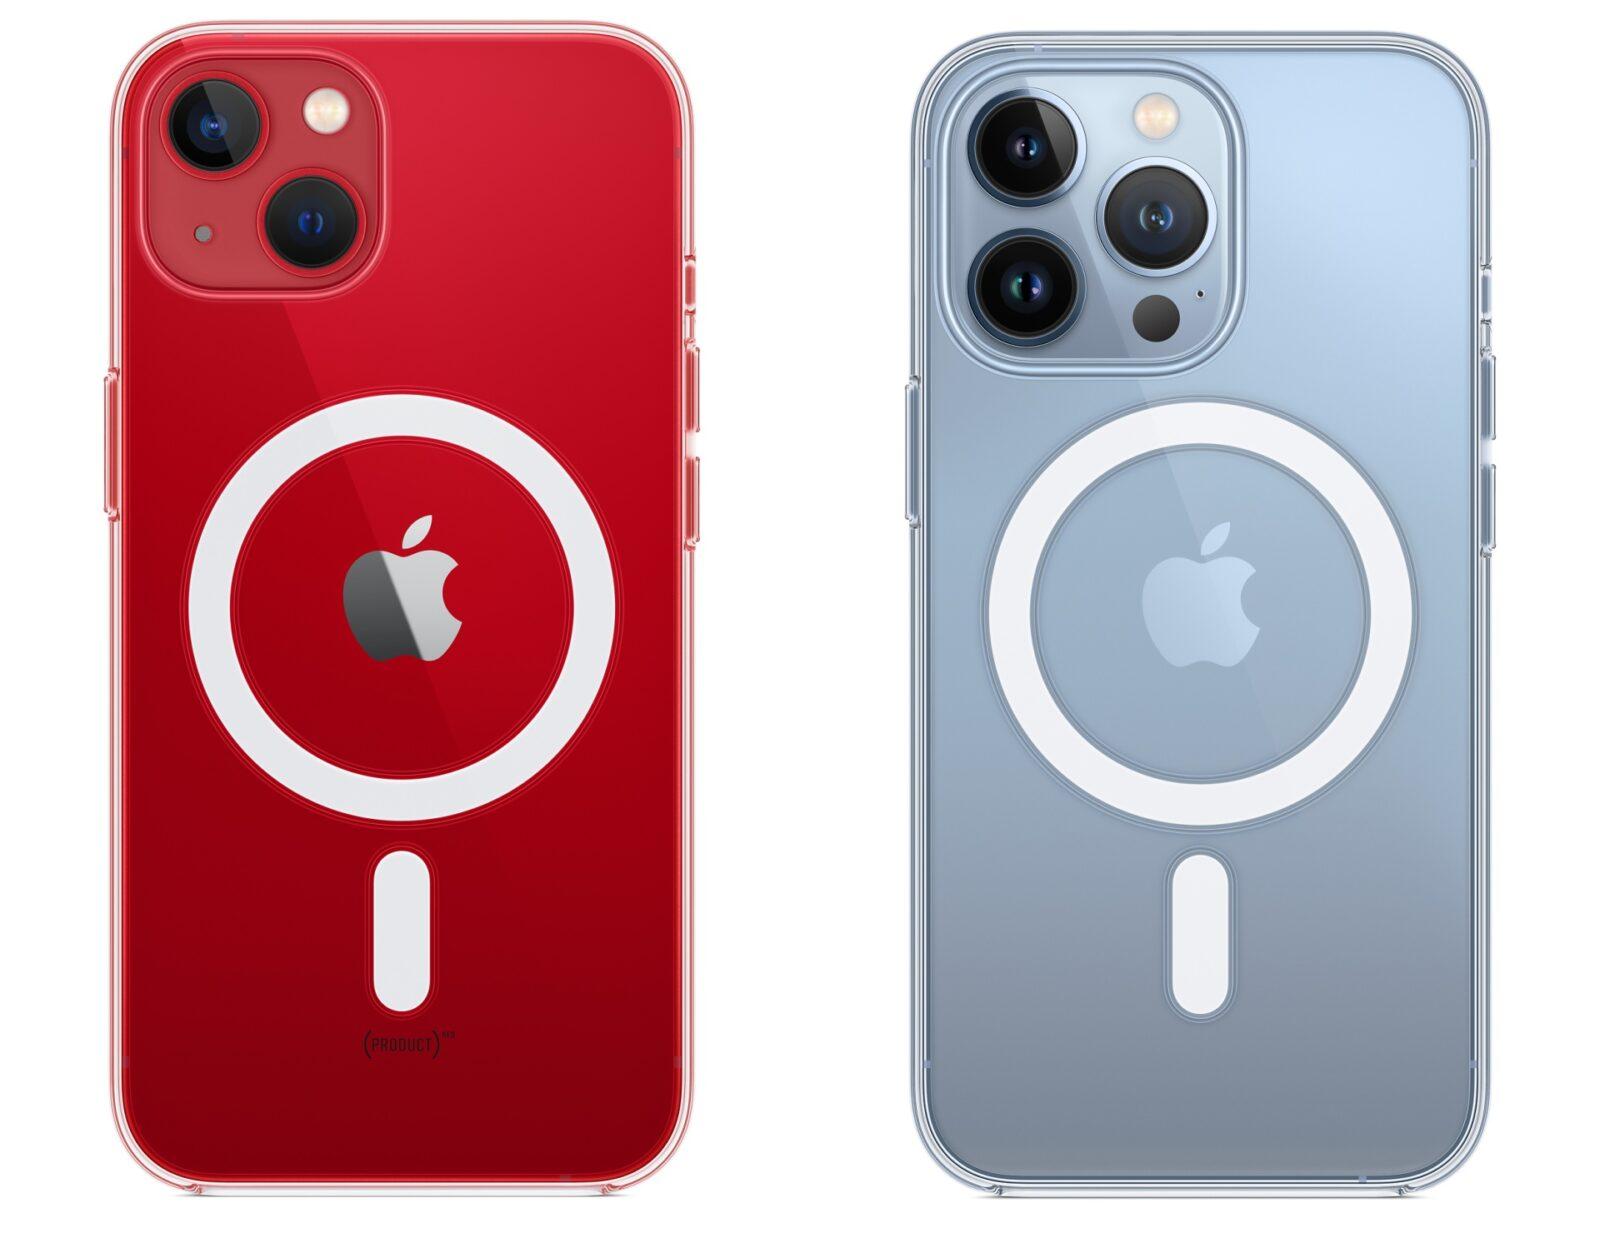 Взгляните на скрытые характеристики iPhone 13 (prozrachnyj chehol magsafe)